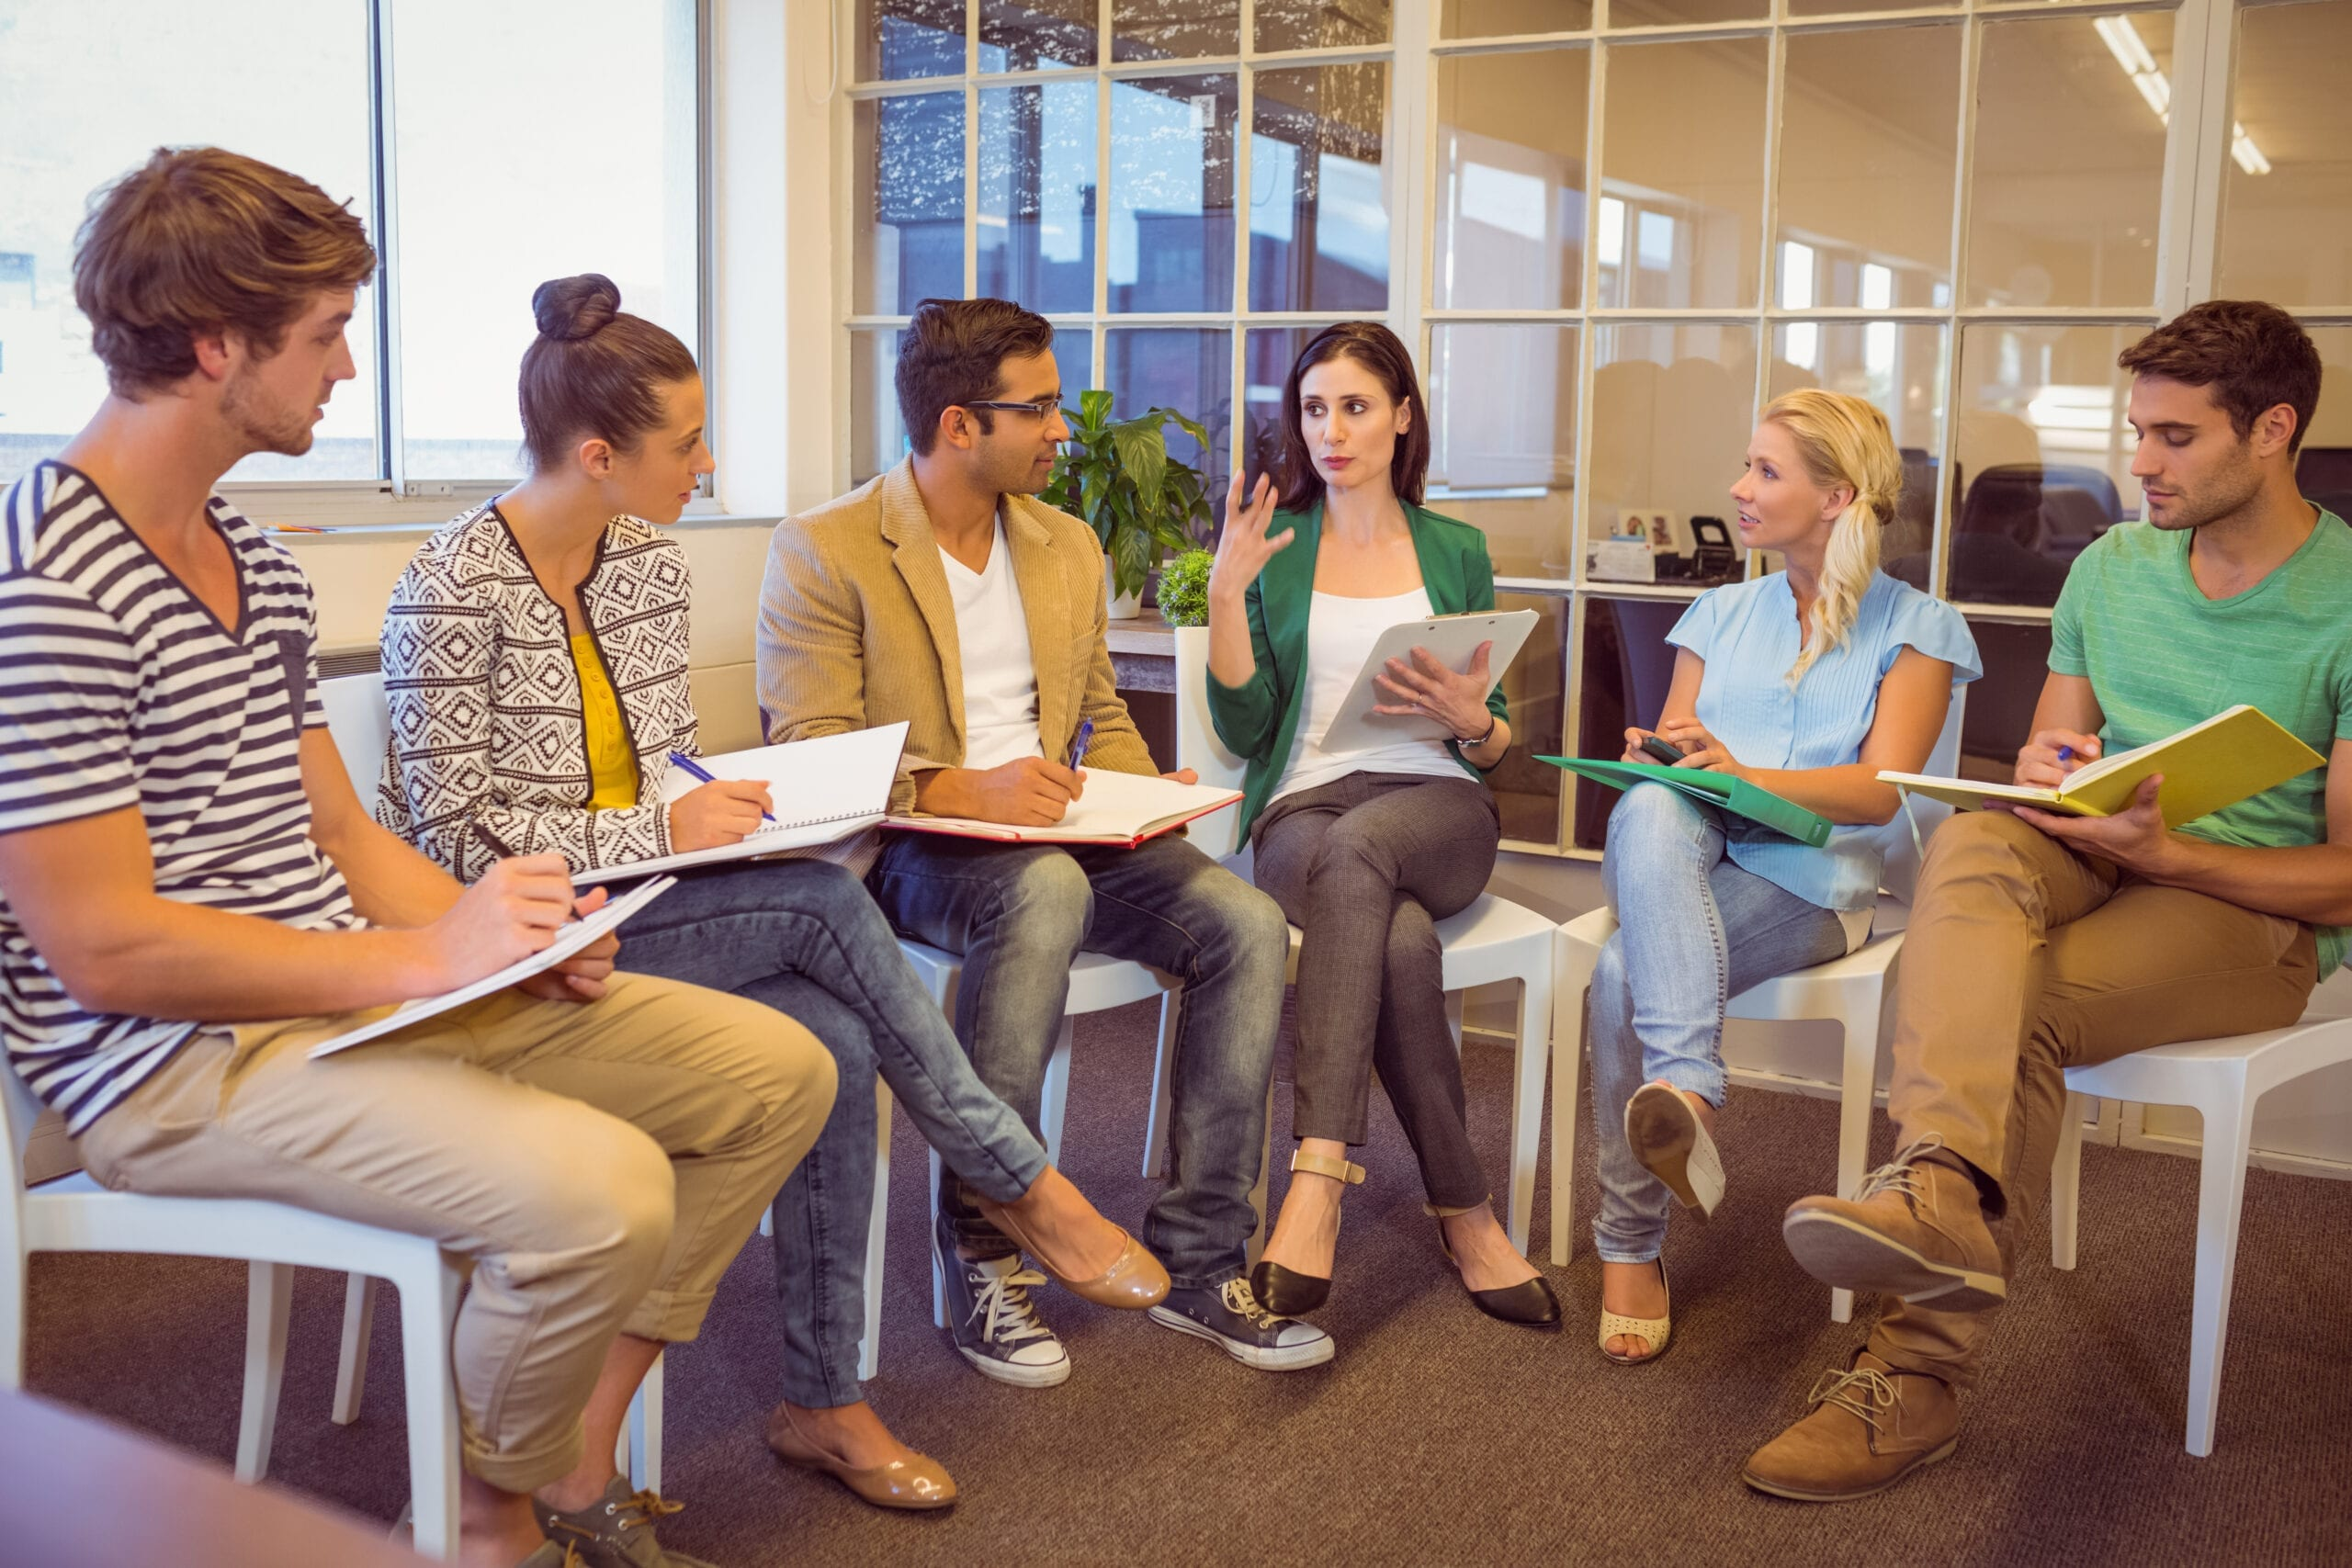 Consumer Testing Focus Group